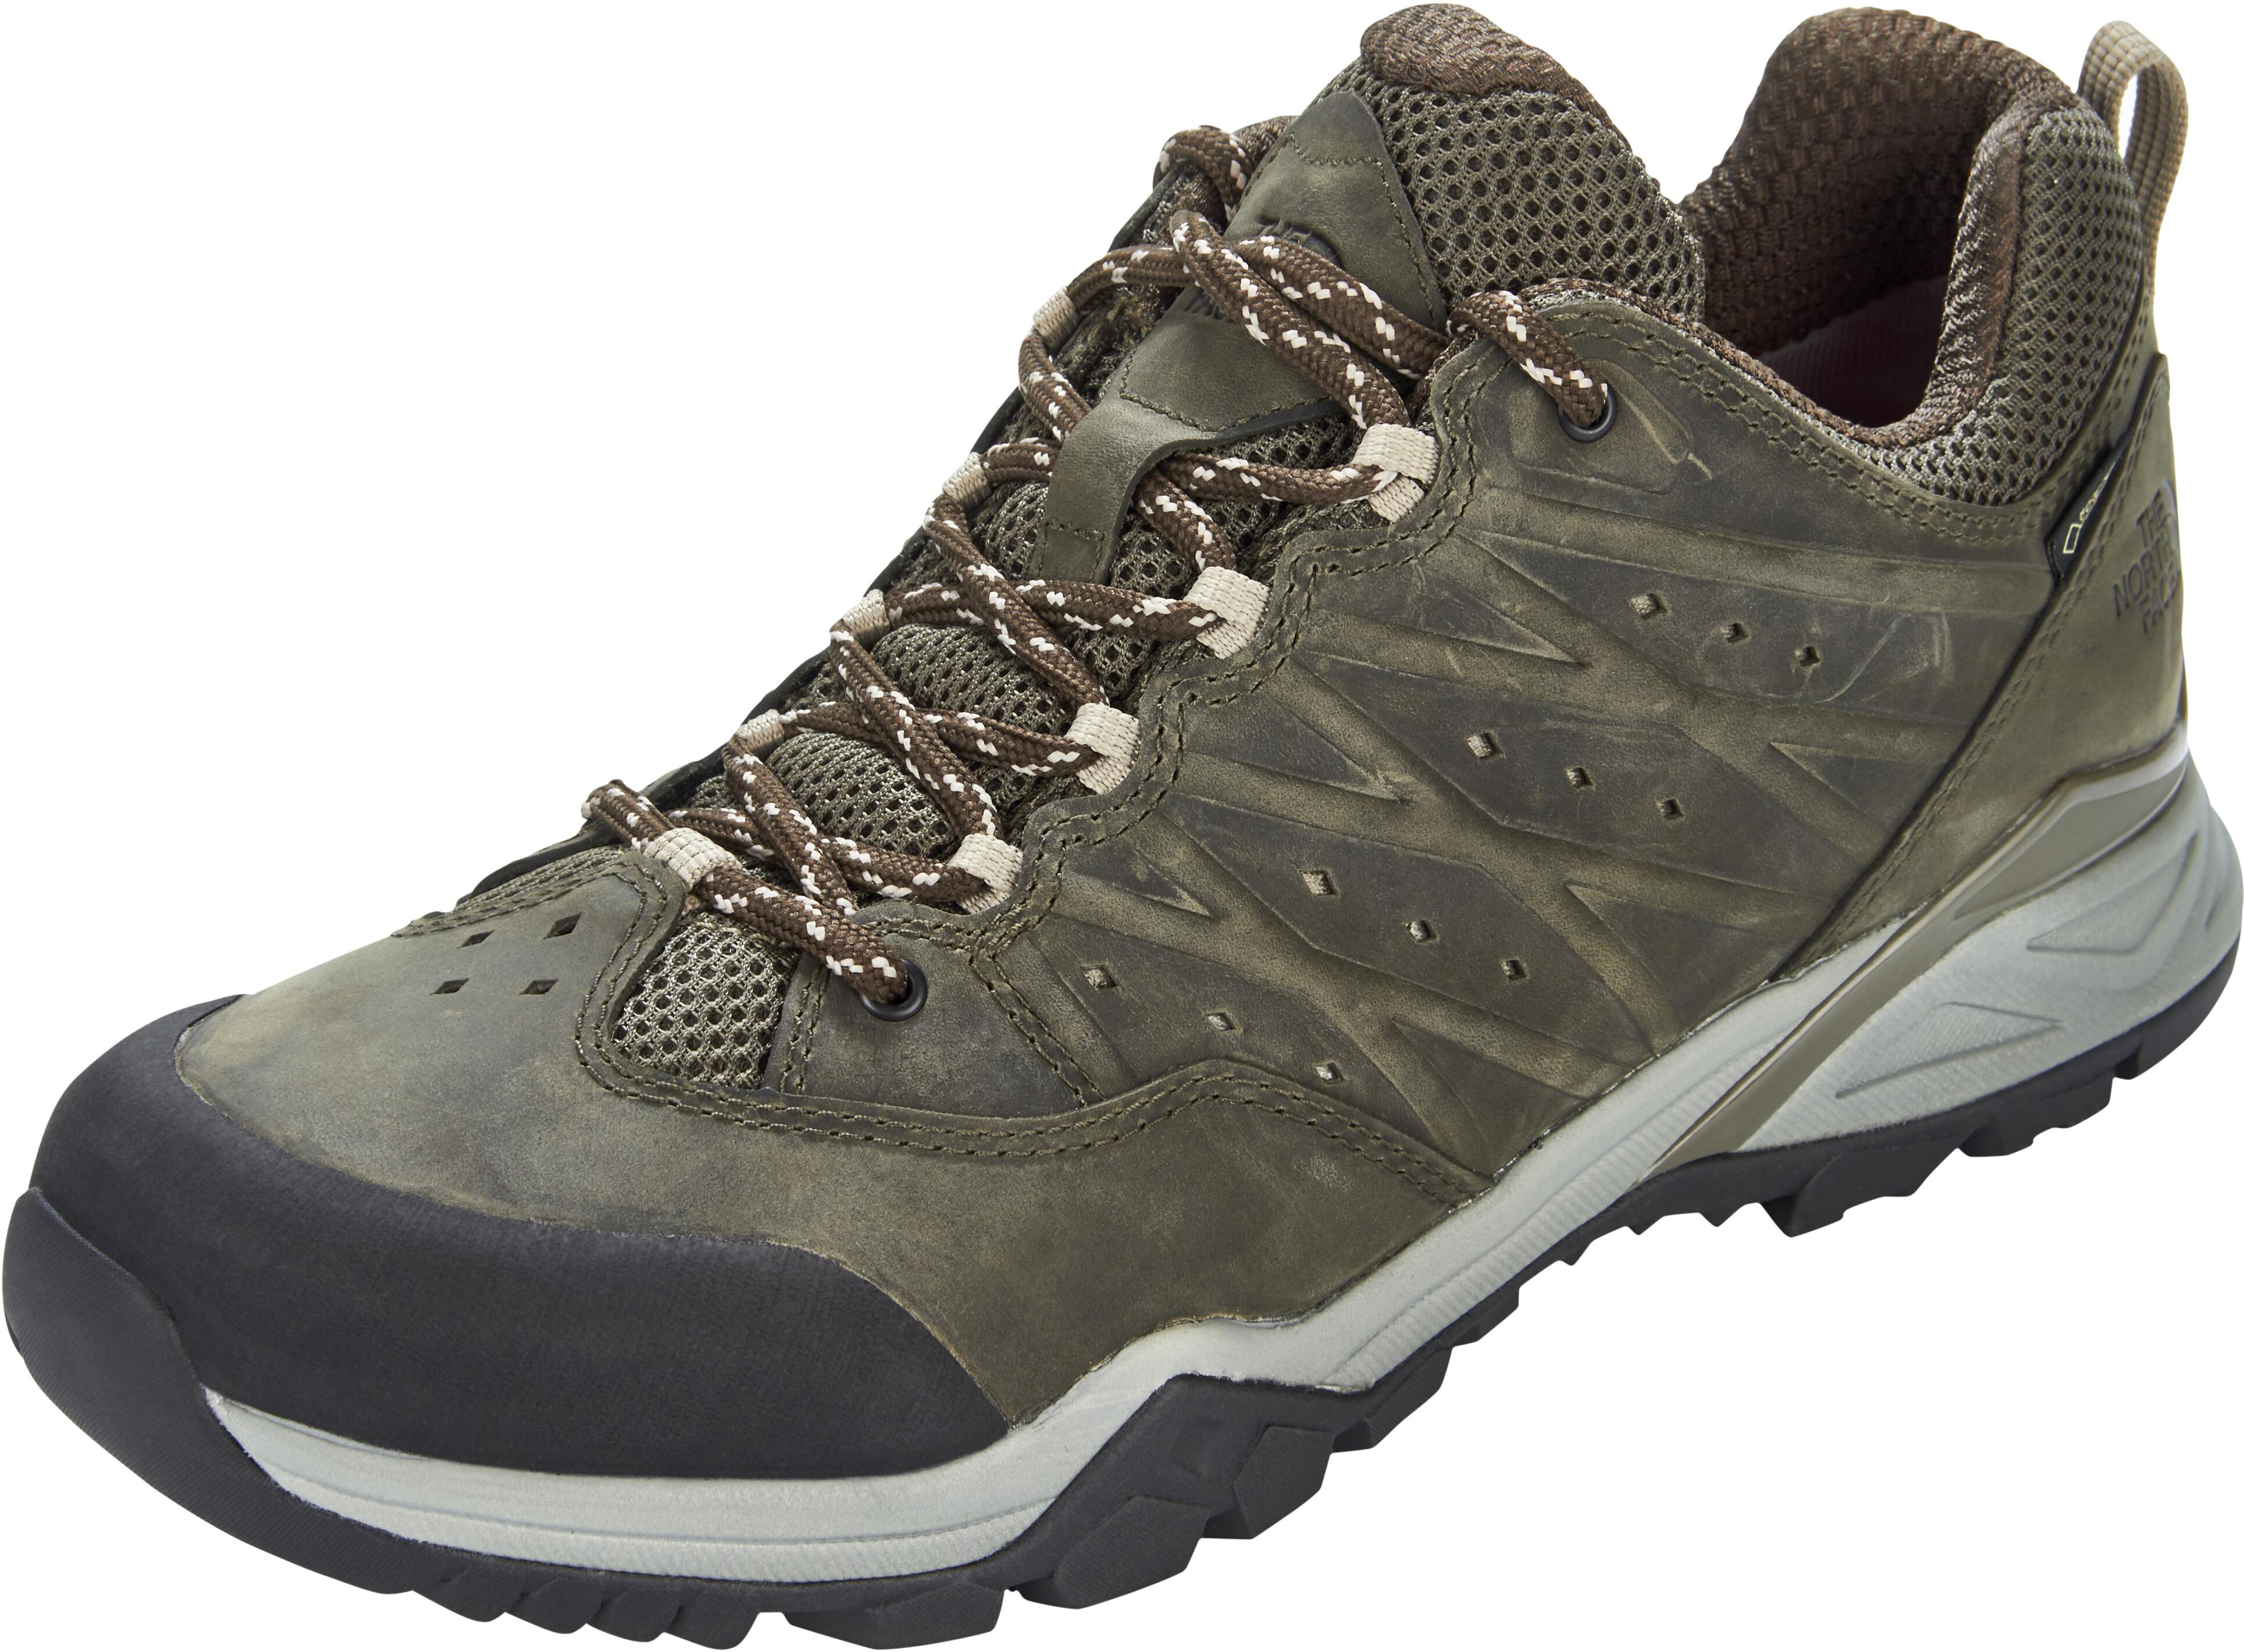 ea6ca880417 The North Face Hedgehog Hike II GTX Schoenen Heren, tarmac green/burnt  olive green